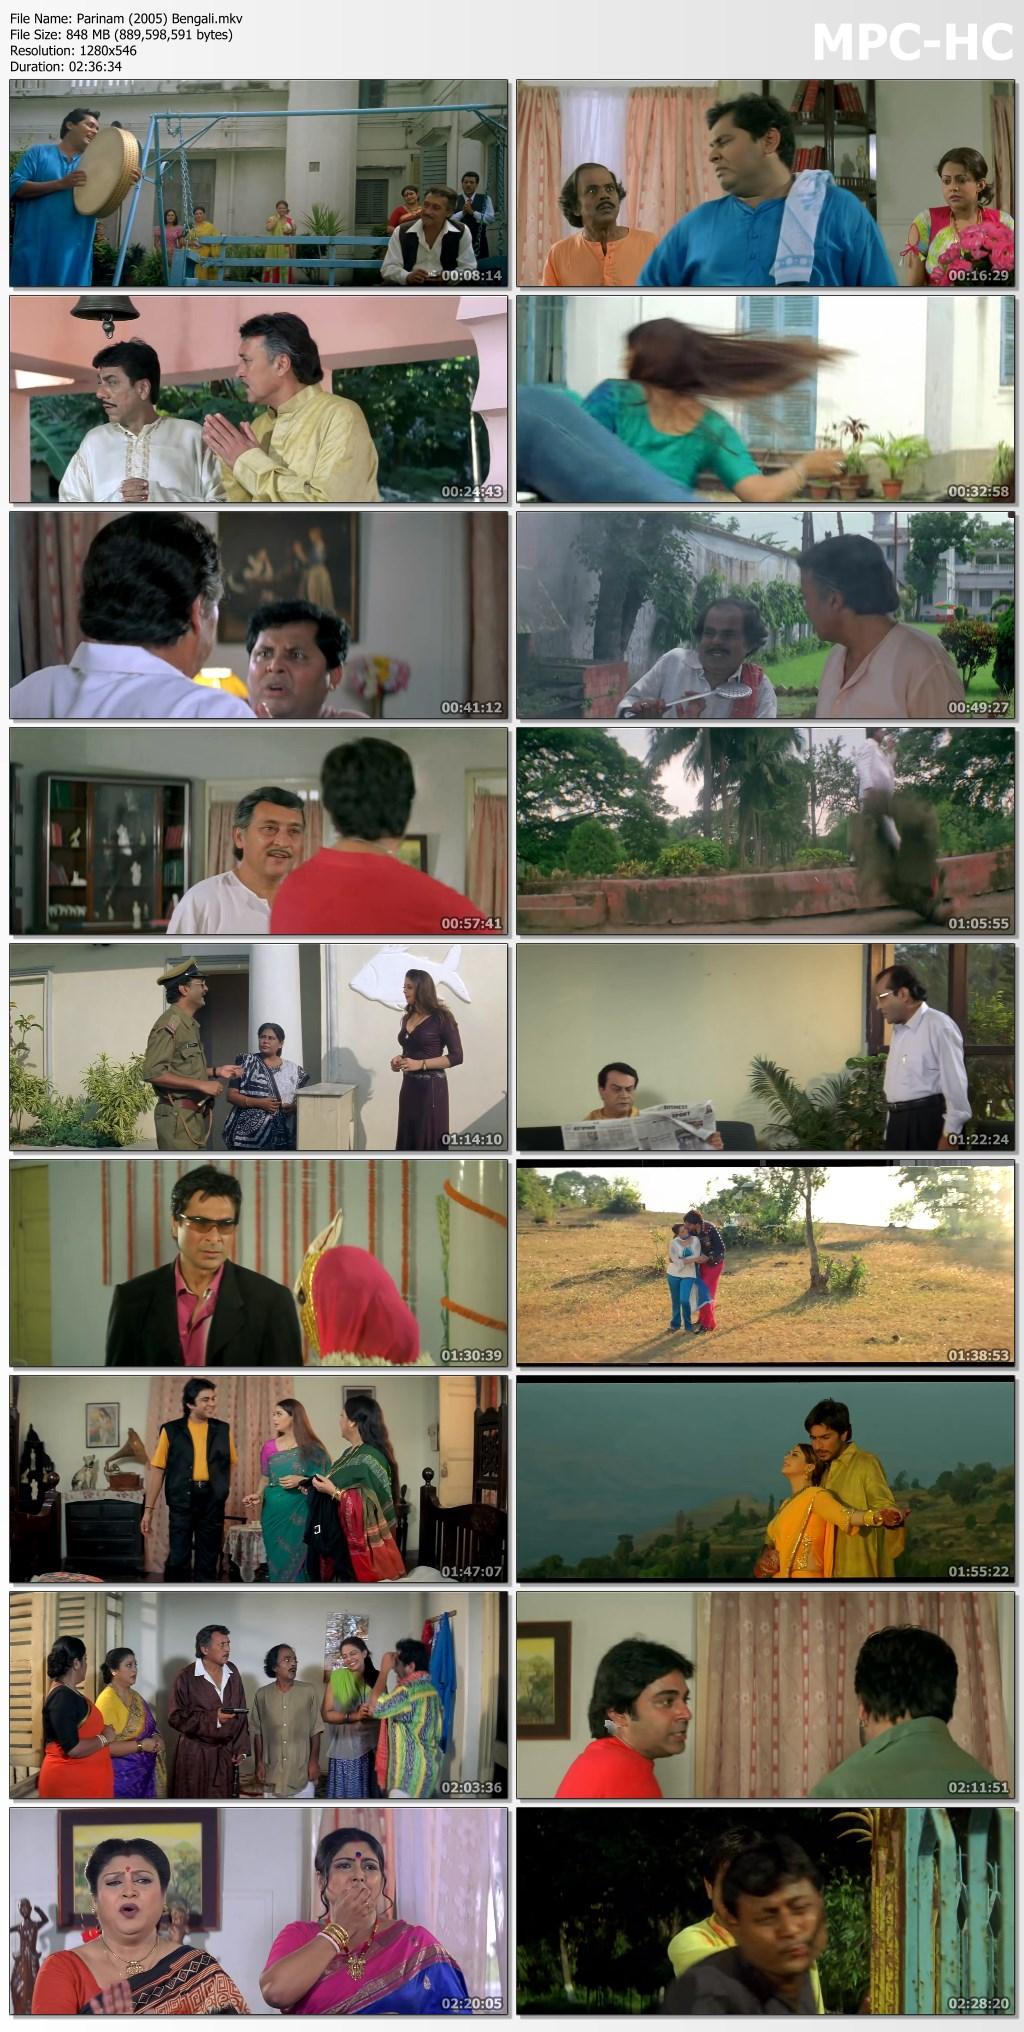 Parinam (2005) Bengali.mkv thumbs